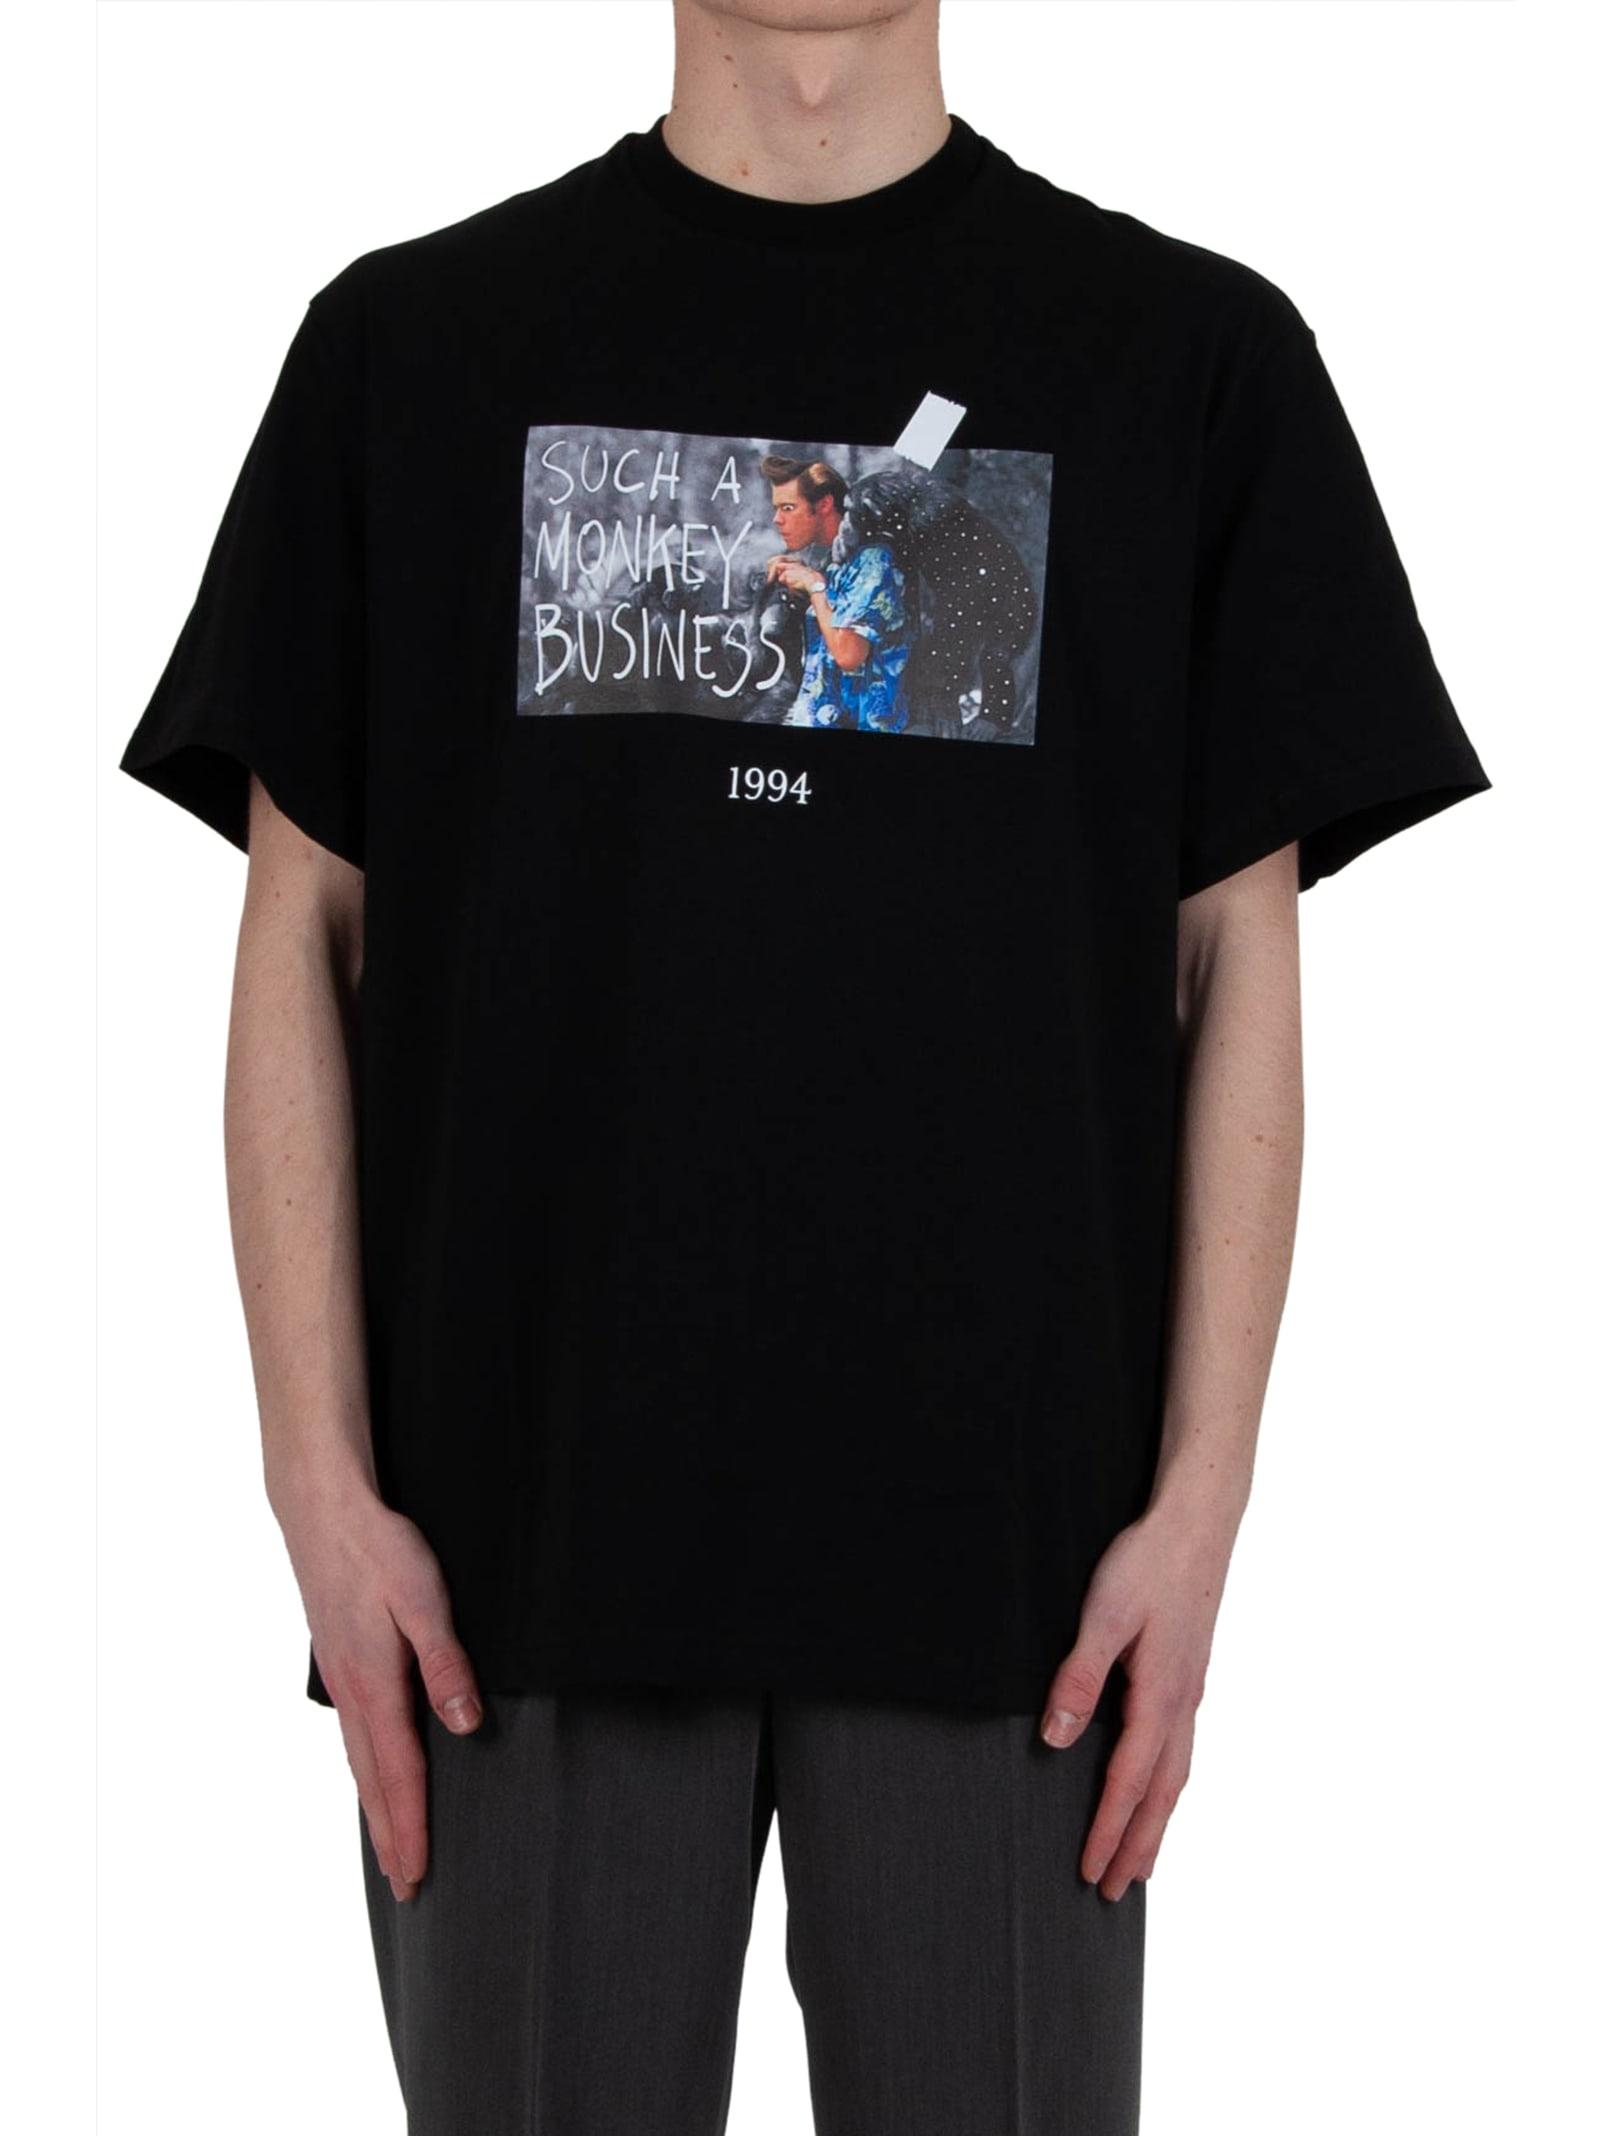 Tbt Ace Ventura - Black